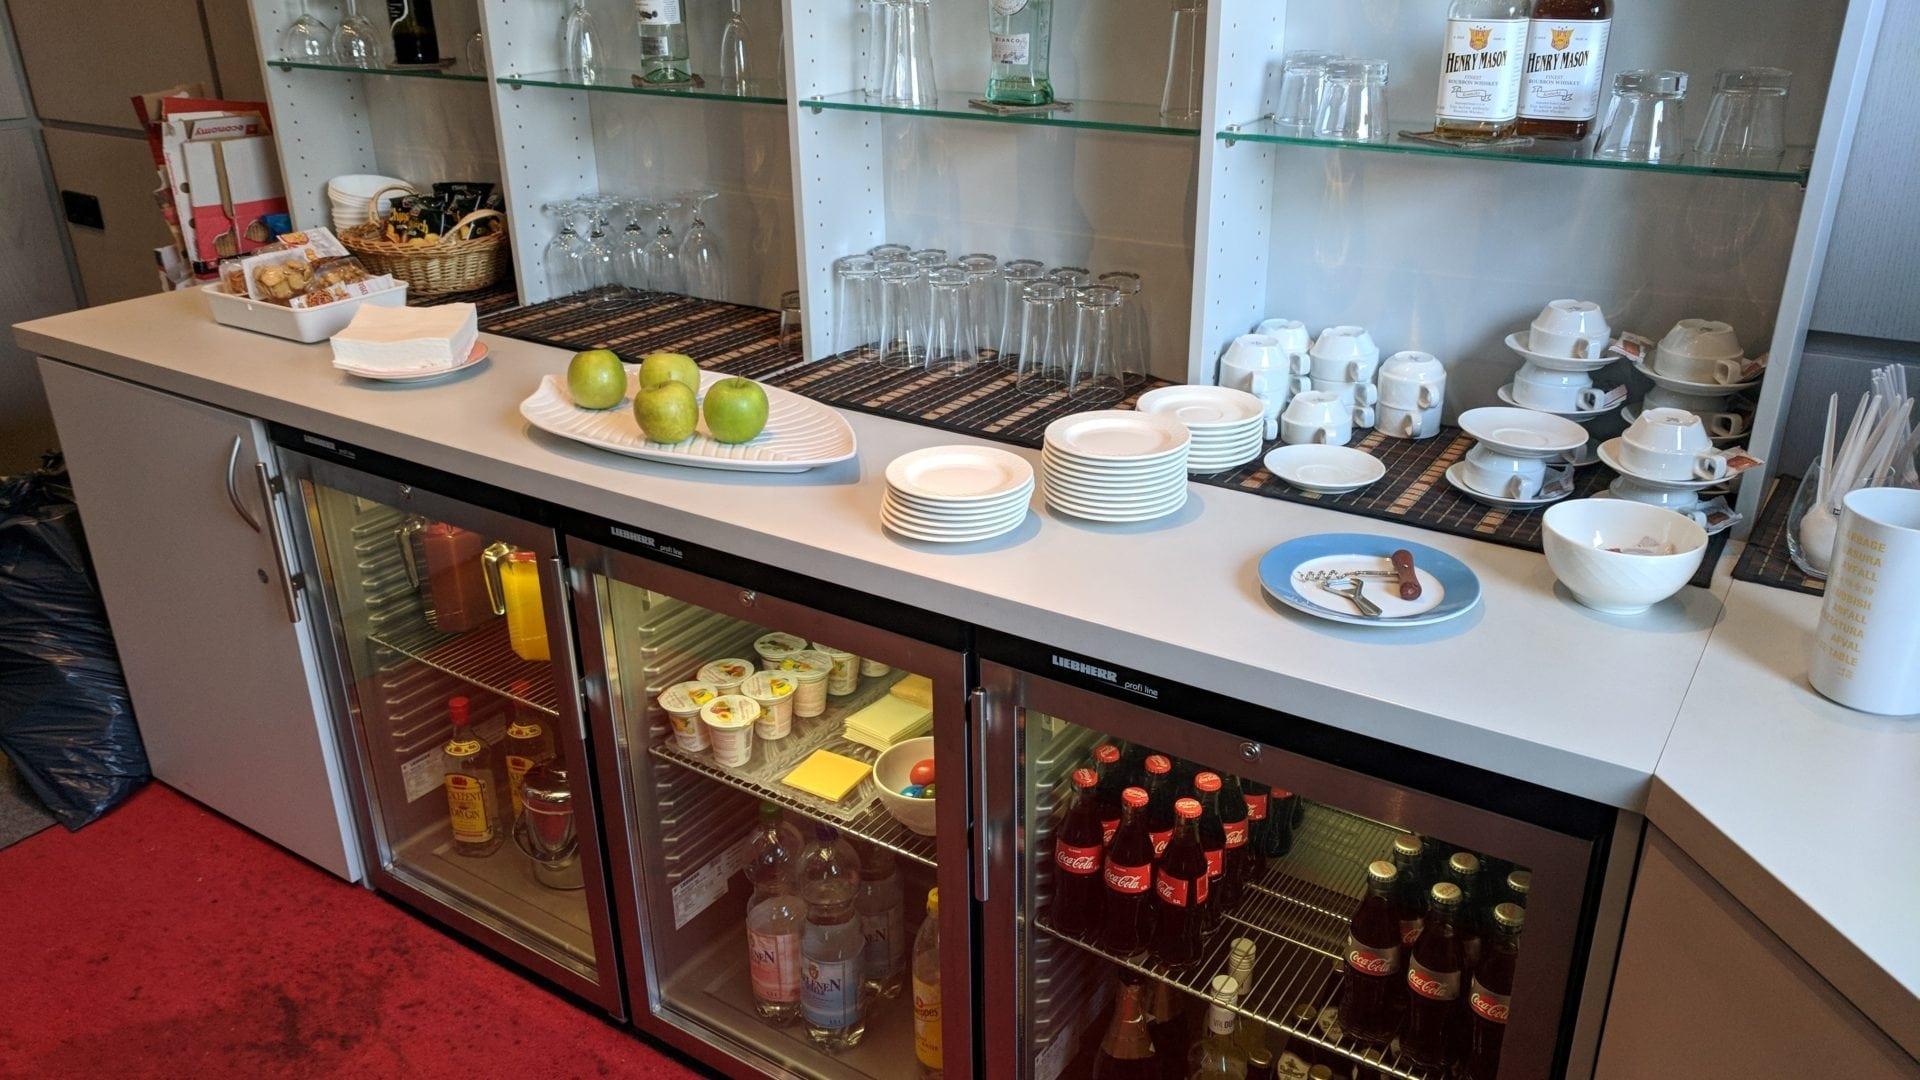 Elli Beinhorn Lounge Stuttgart Catering